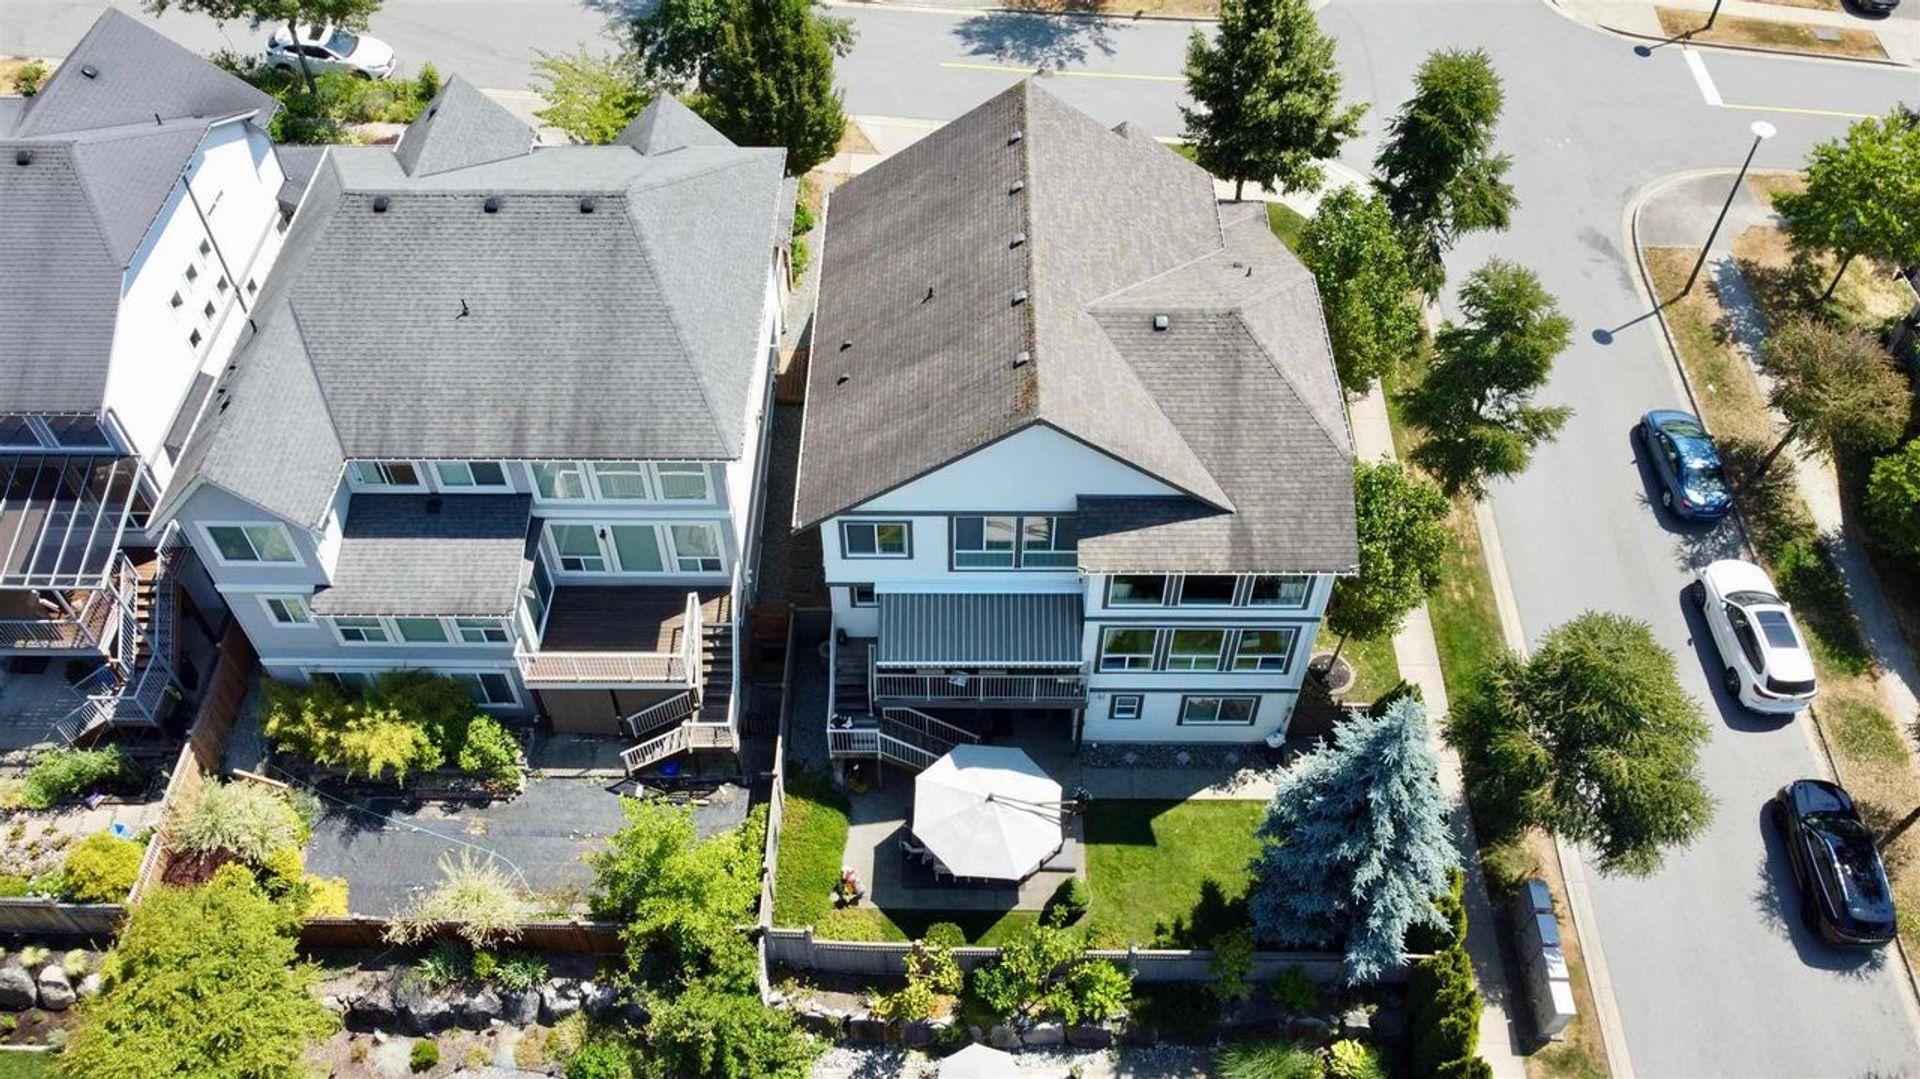 1466-nanton-street-burke-mountain-coquitlam-40 at 1466 Nanton Street, Burke Mountain, Coquitlam